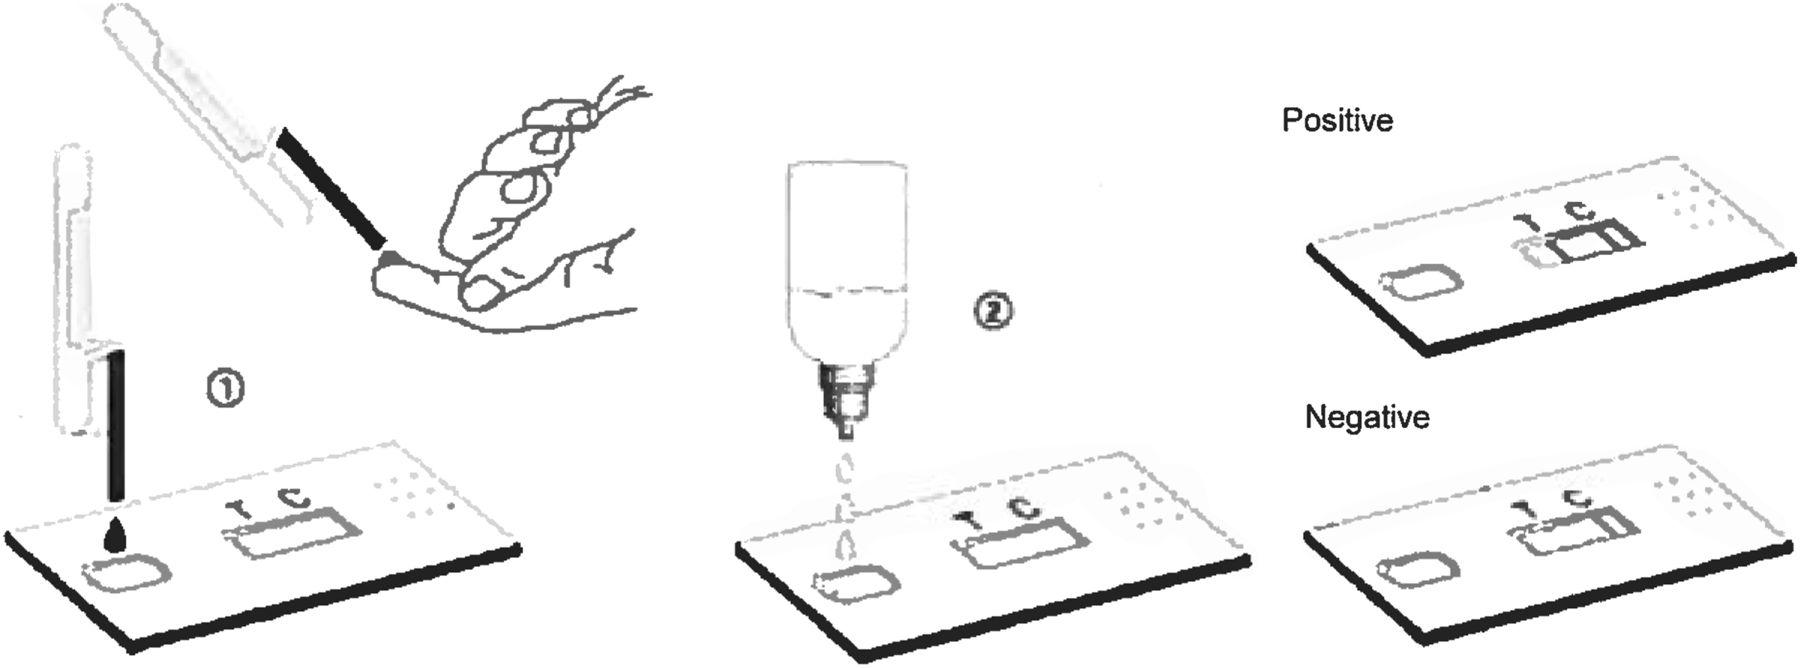 Performance of a bedside test for tetanus immunity